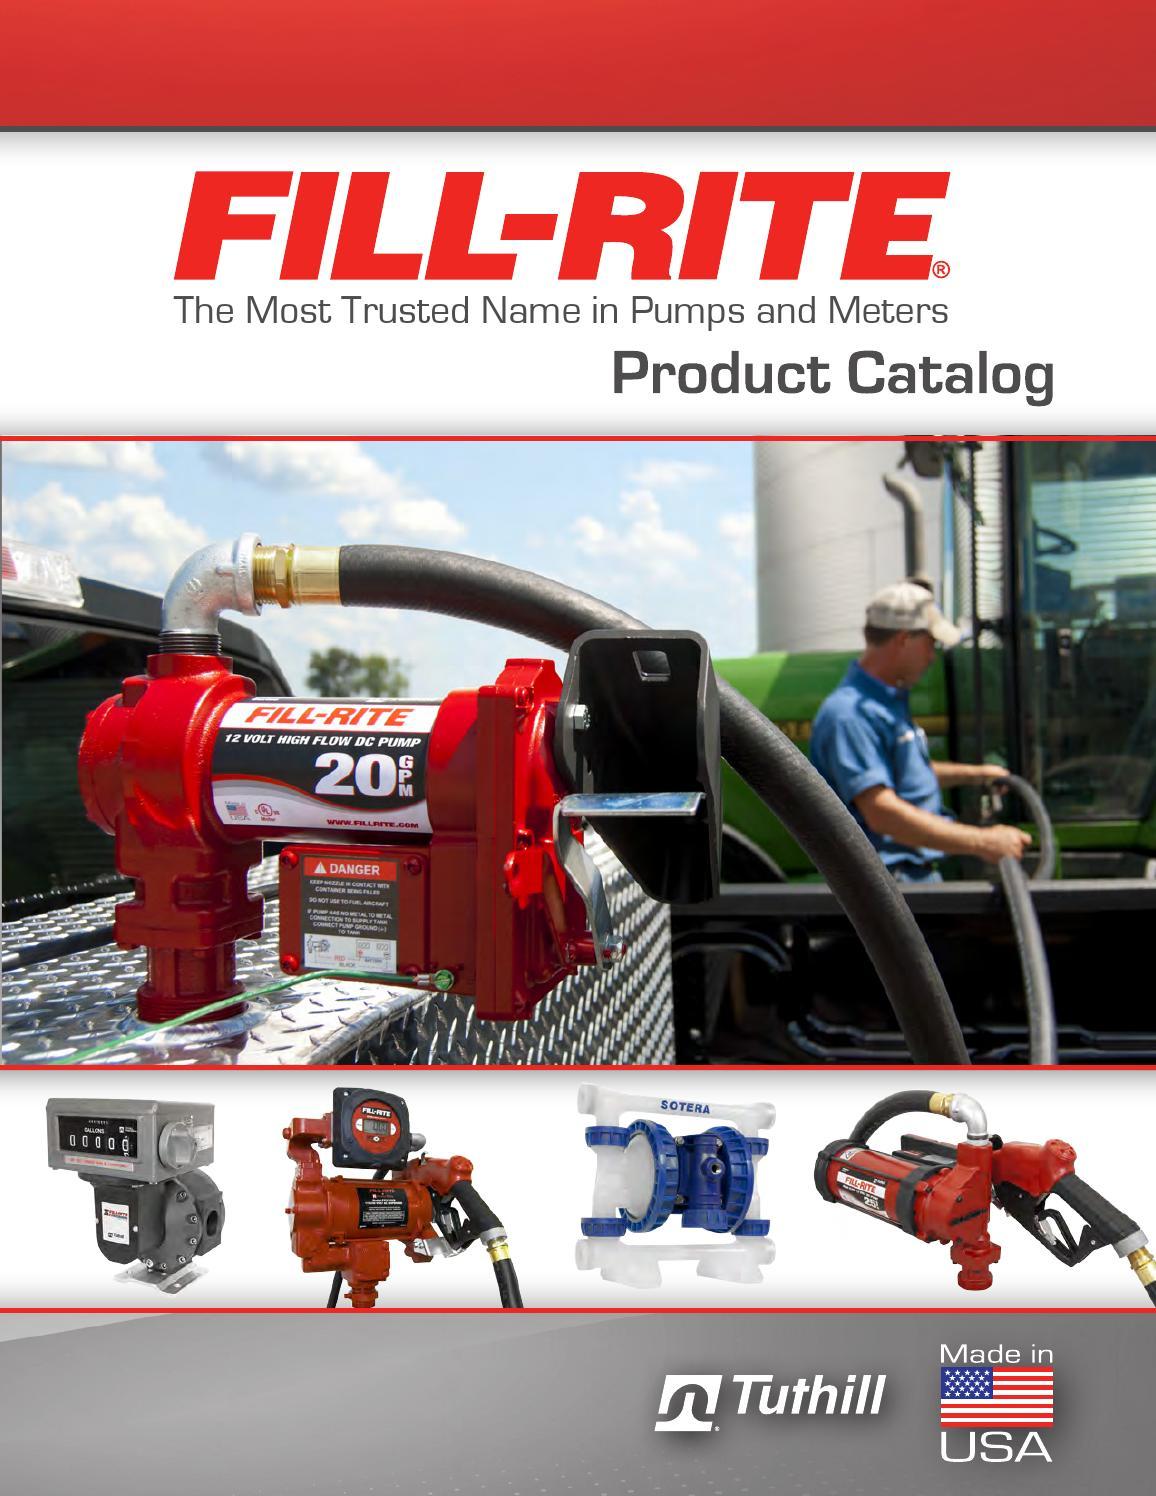 10 GPM 8' Hose Fill Rite FIL FR112 Rotary Hand Pump